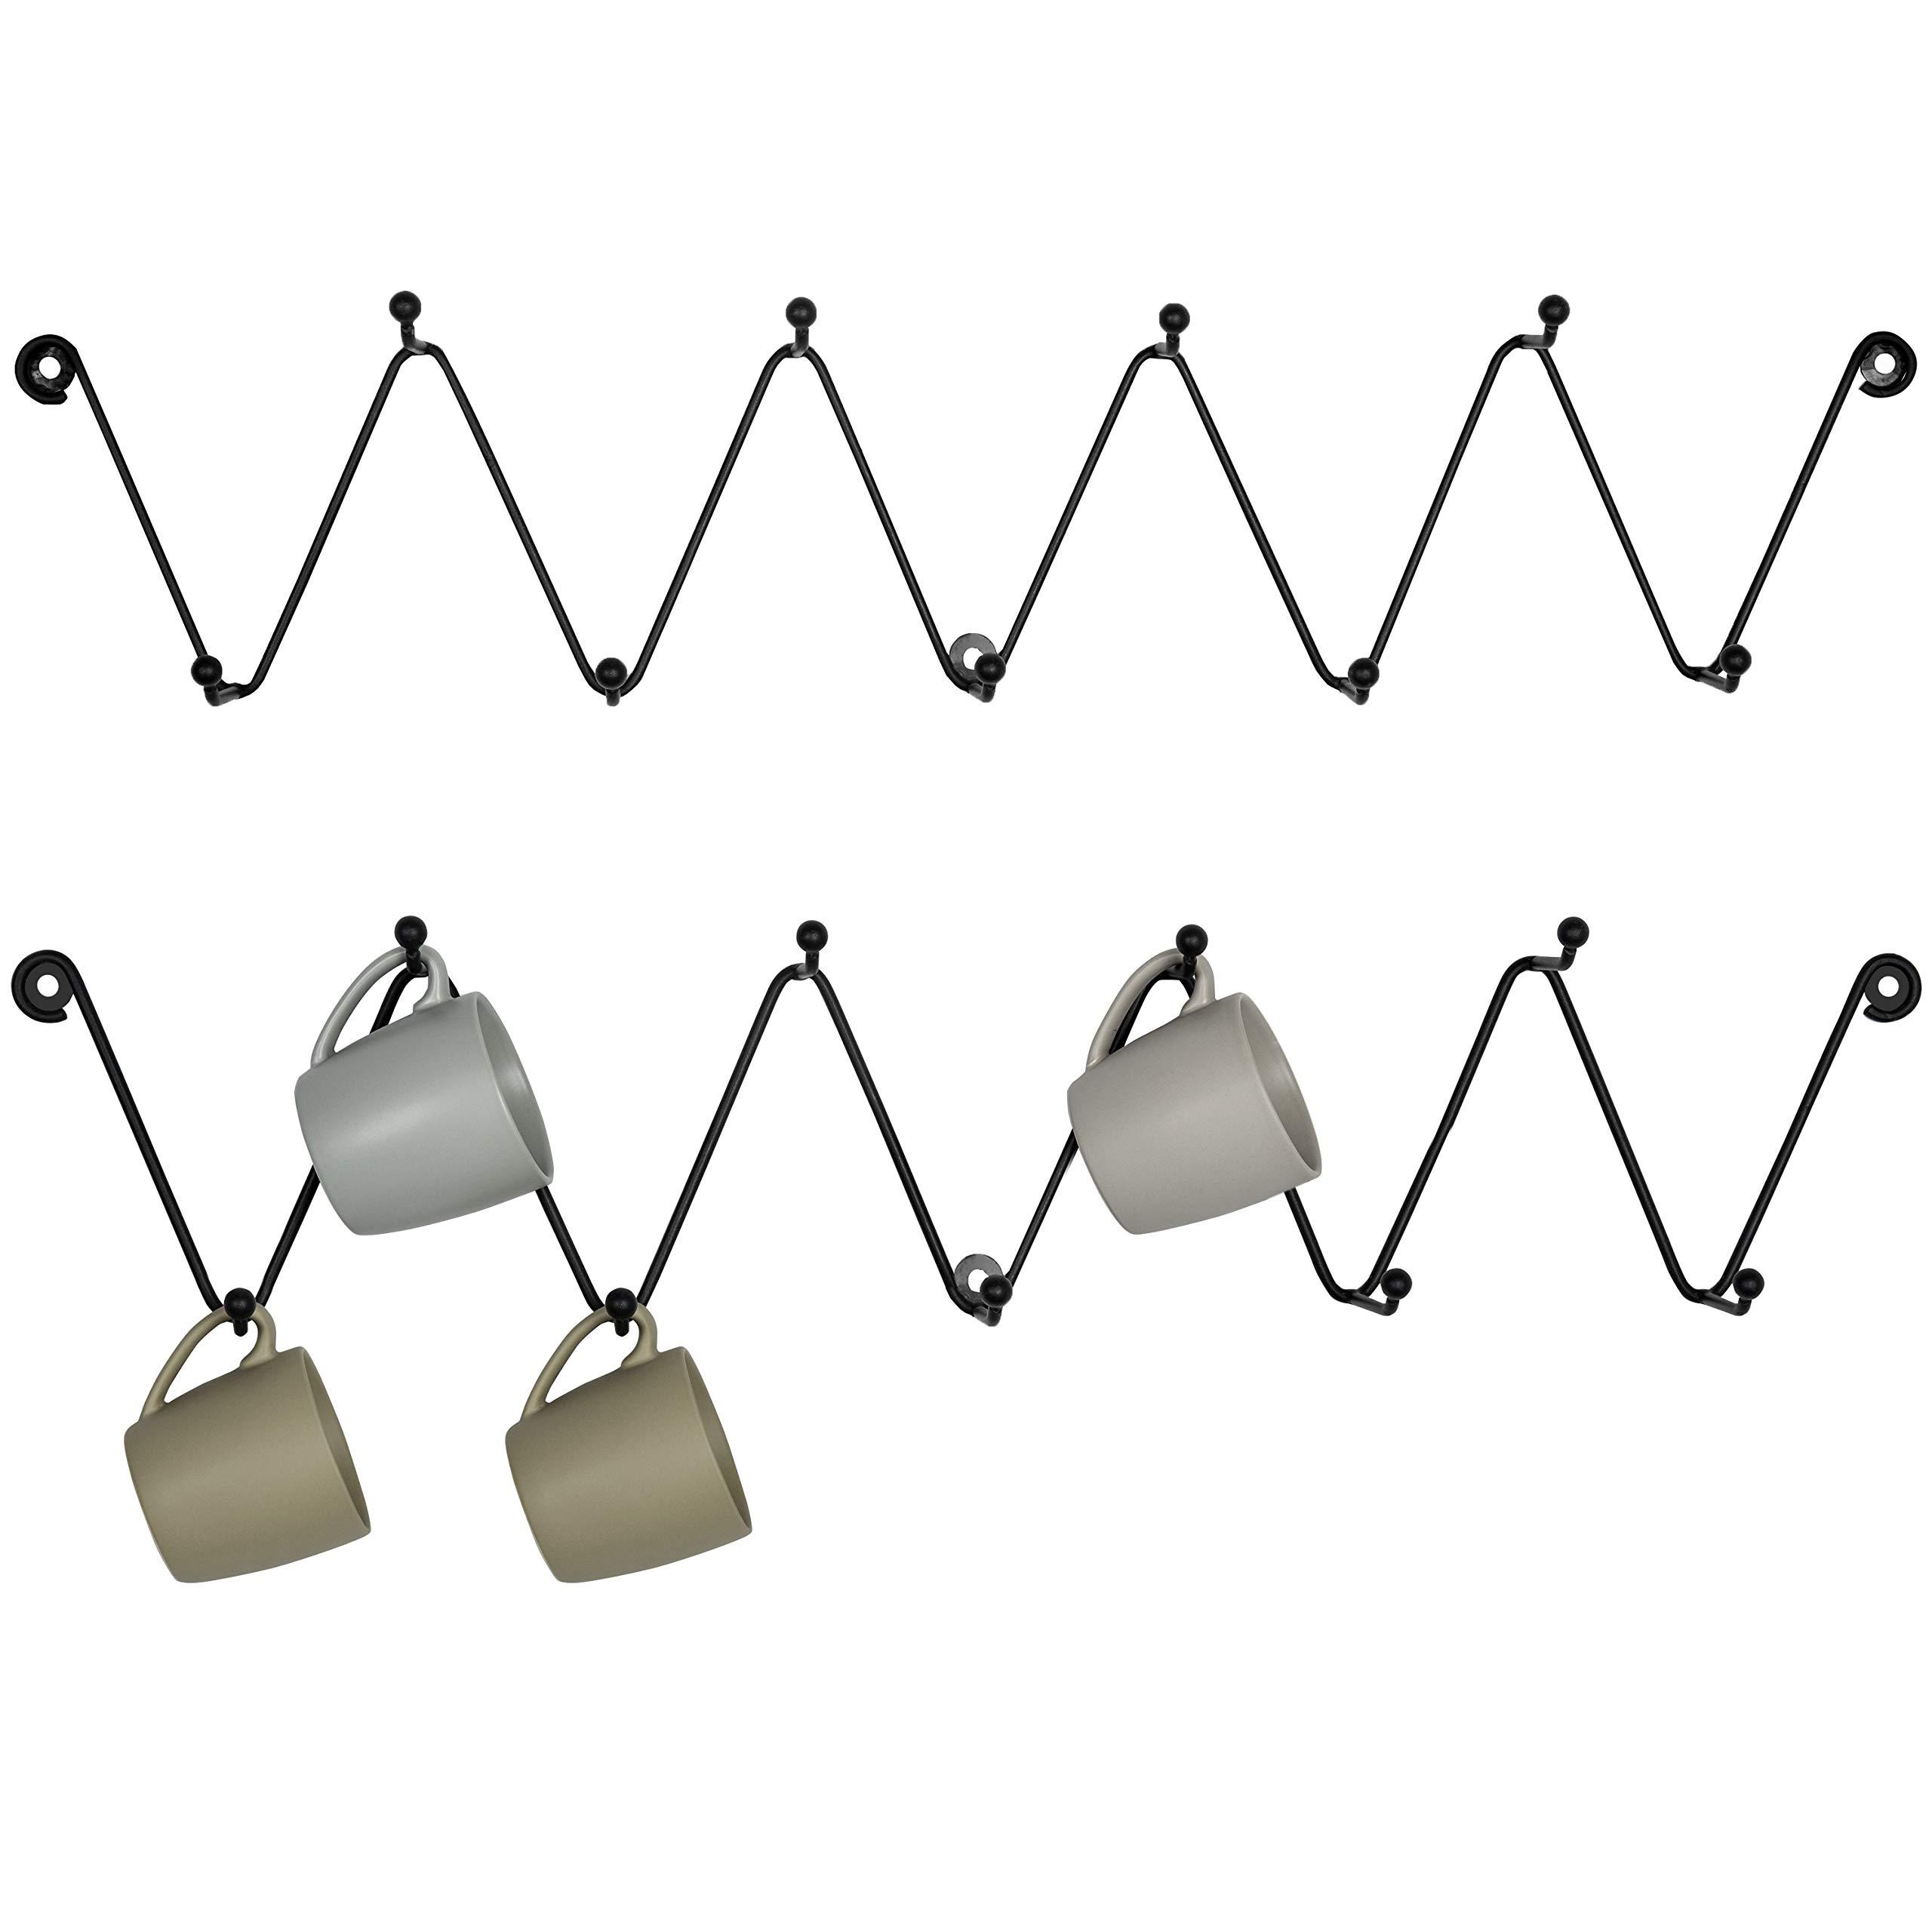 MyGift Black Metal Zig-Zag Wall-Mounted 9-Hook Mug Racks, Set of 2 by MyGift